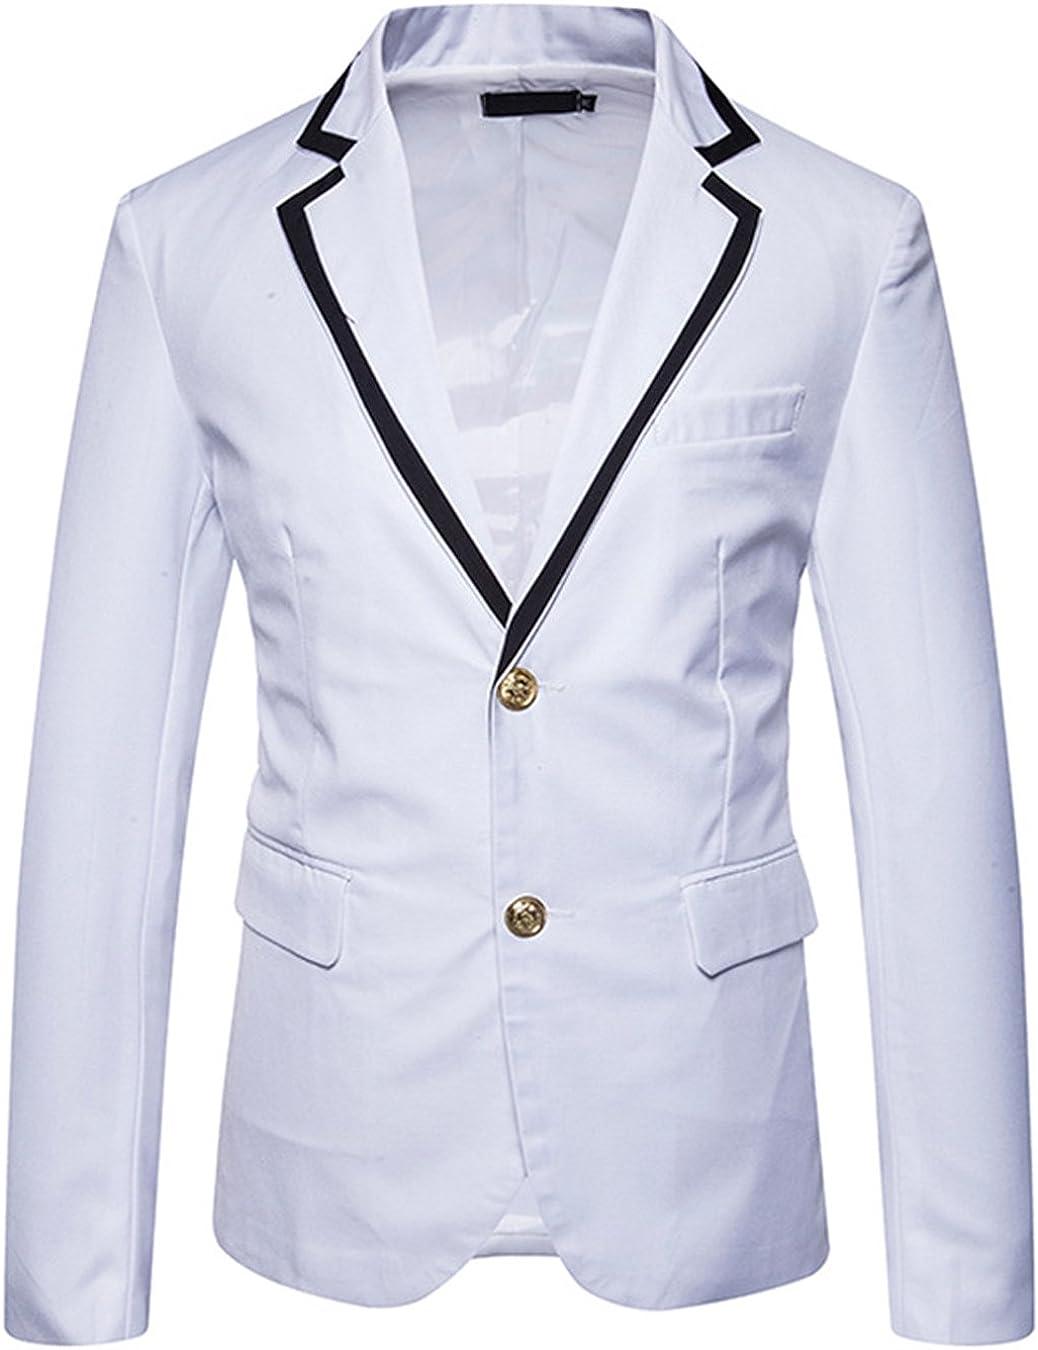 JASSYOY Mens Peak Lapel Collar Slim Fit Two Button Blazer Coats Jackets